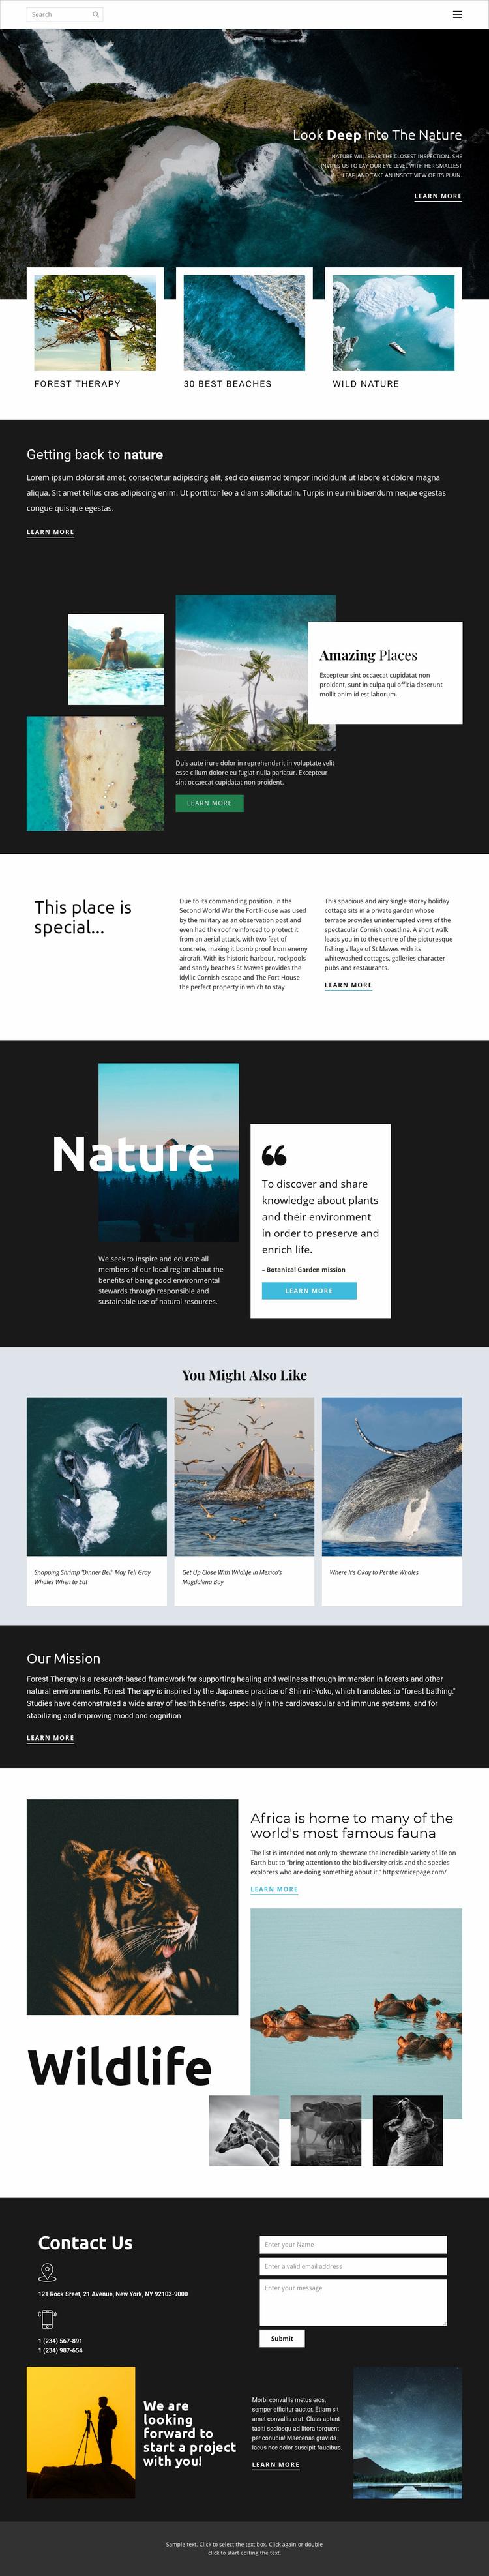 Exploring wildlife and nature Website Design